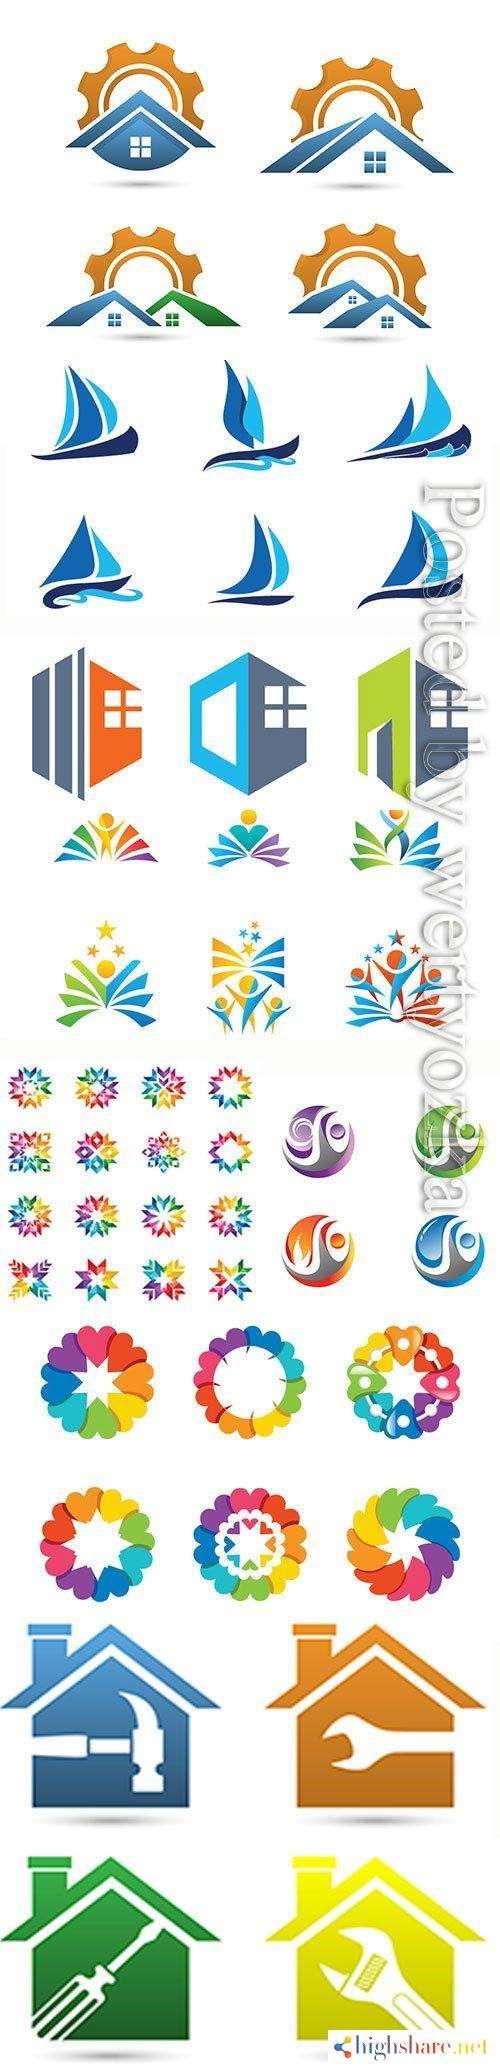 vector modern logo design template 5f430bfc39920 - Vector modern logo design template